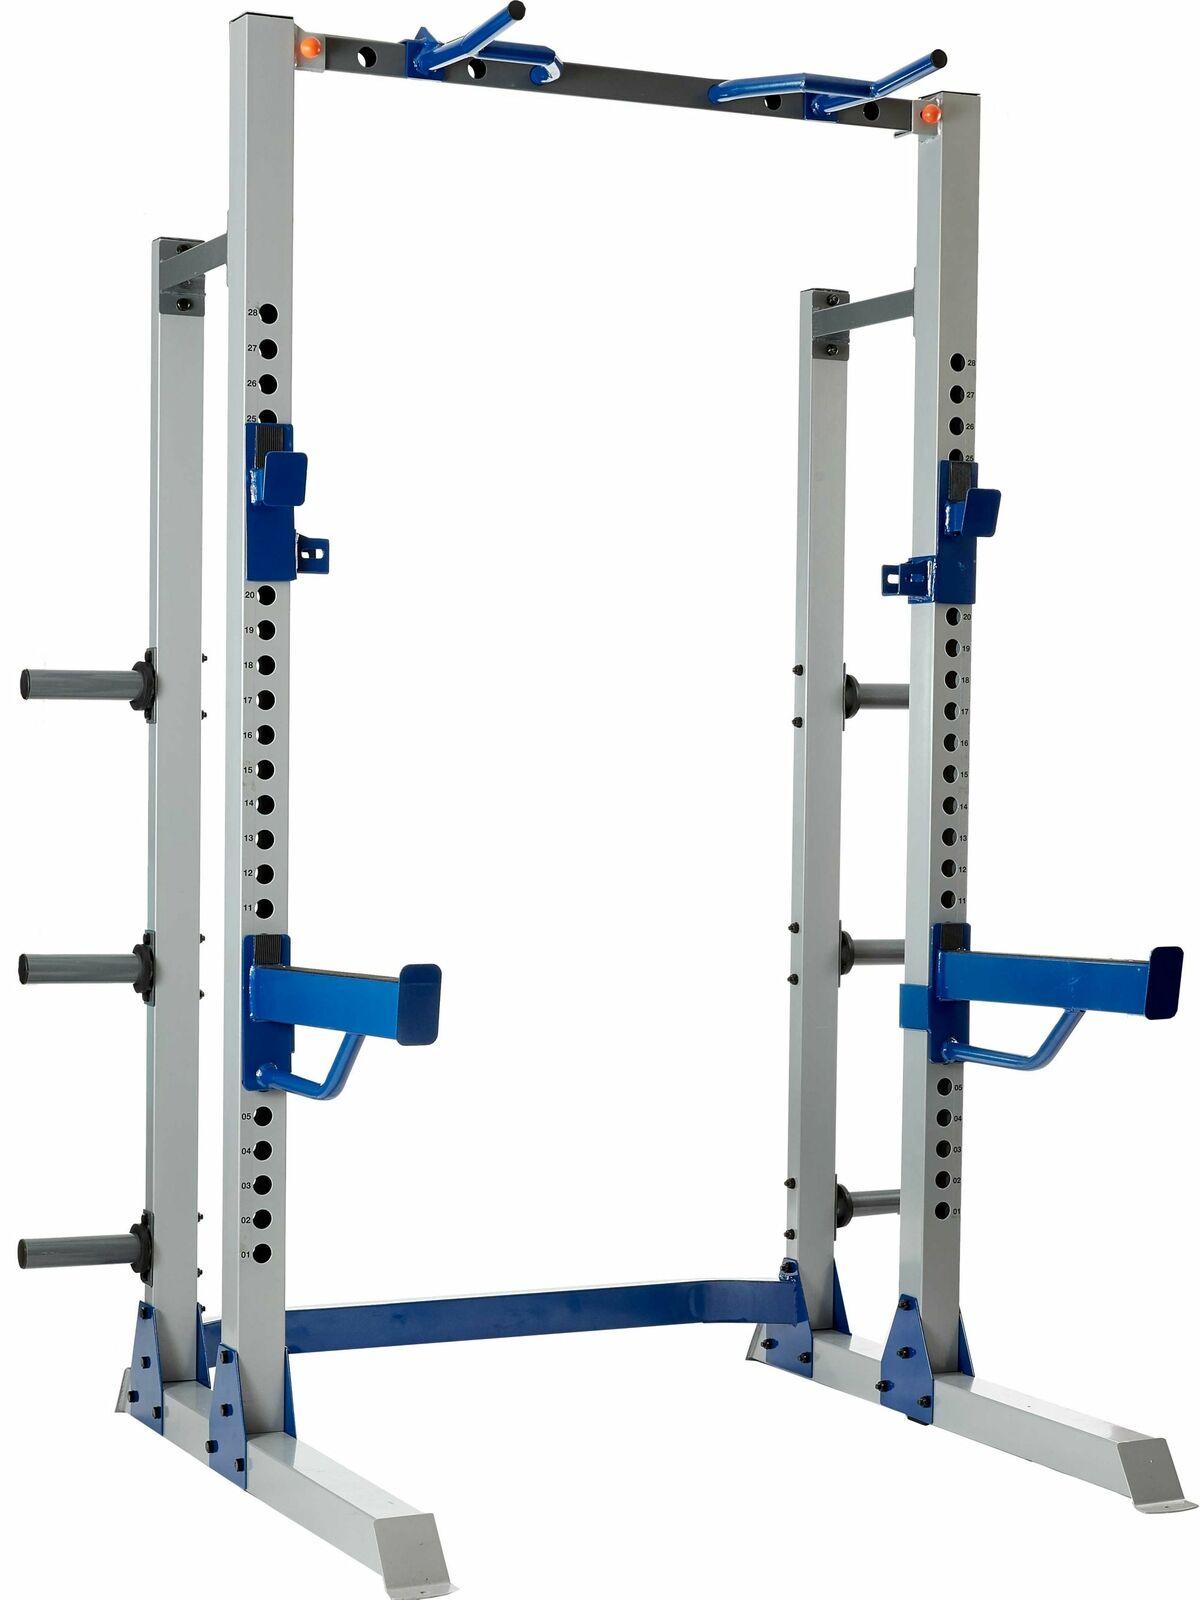 Powertec Fitness Workbench Half Rack For Sale Online Ebay